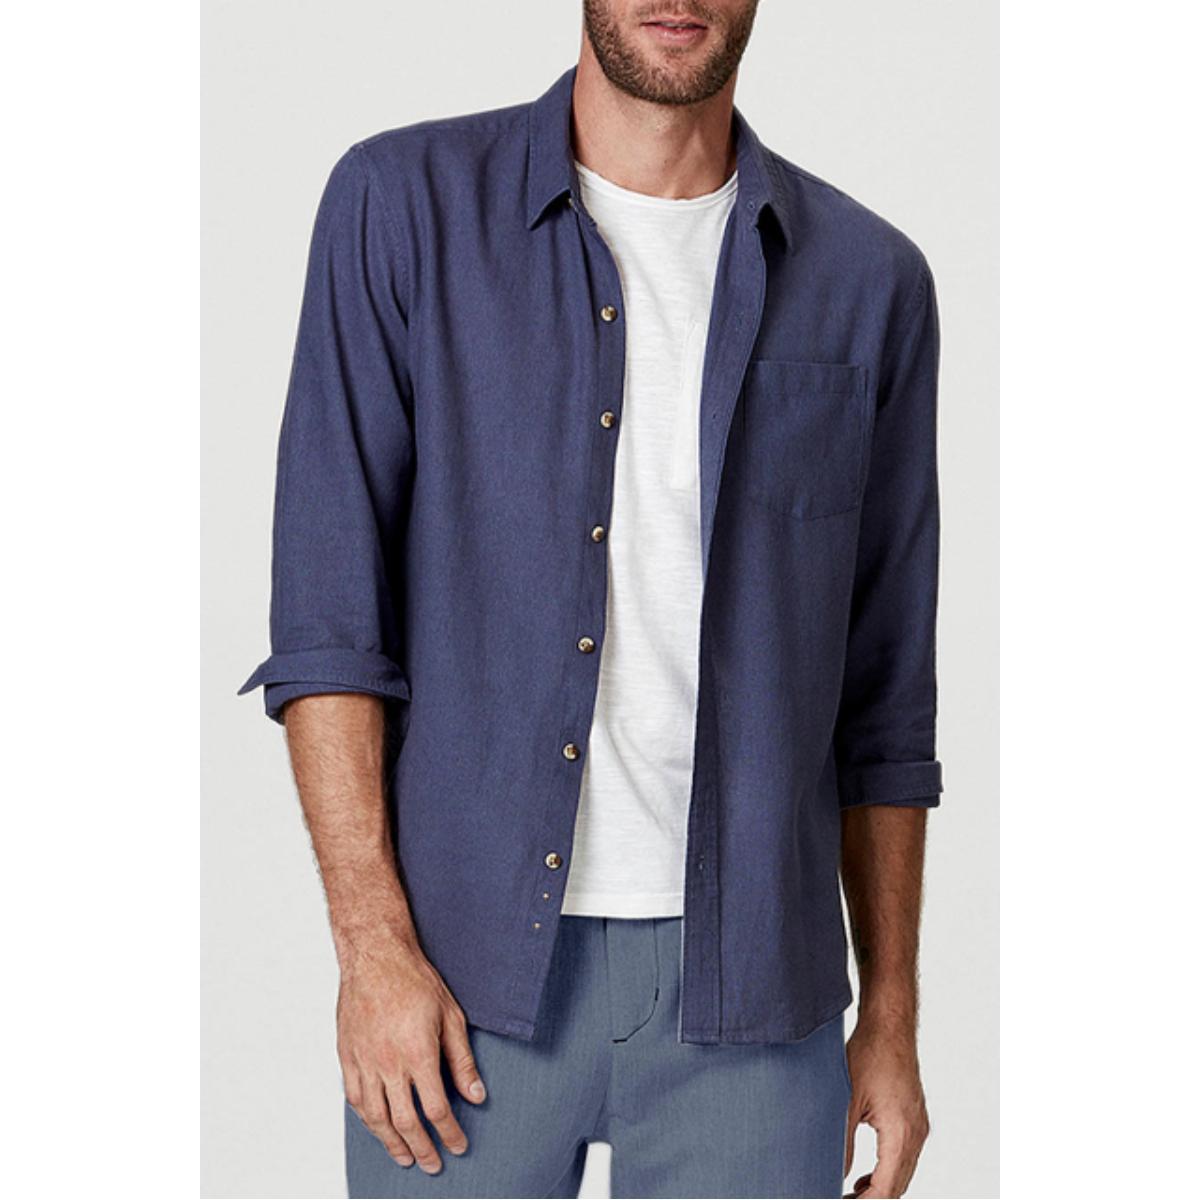 Camisa Masculina Hering K48f 1csi Jeans